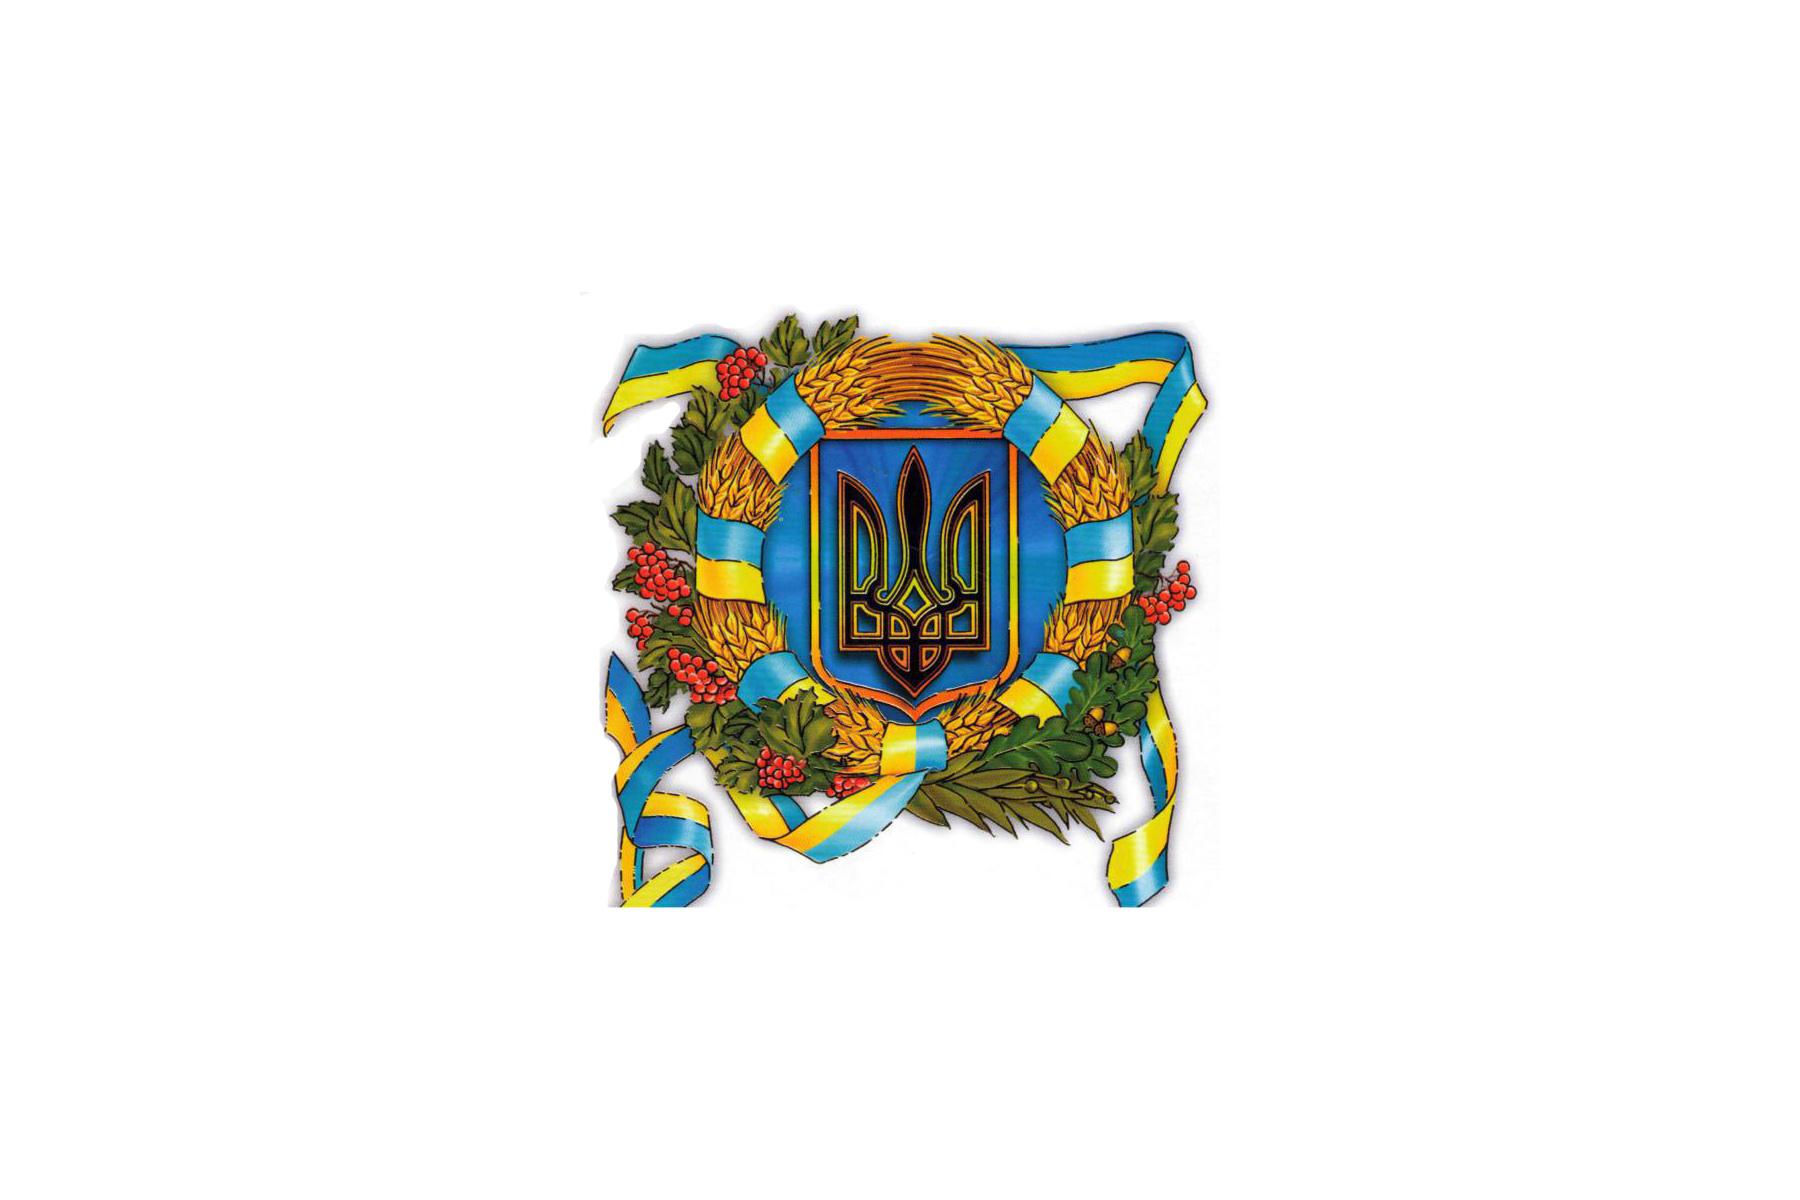 HDoboi.Kiev.ua - герб, Украина, патриотические обои, Украинская символика